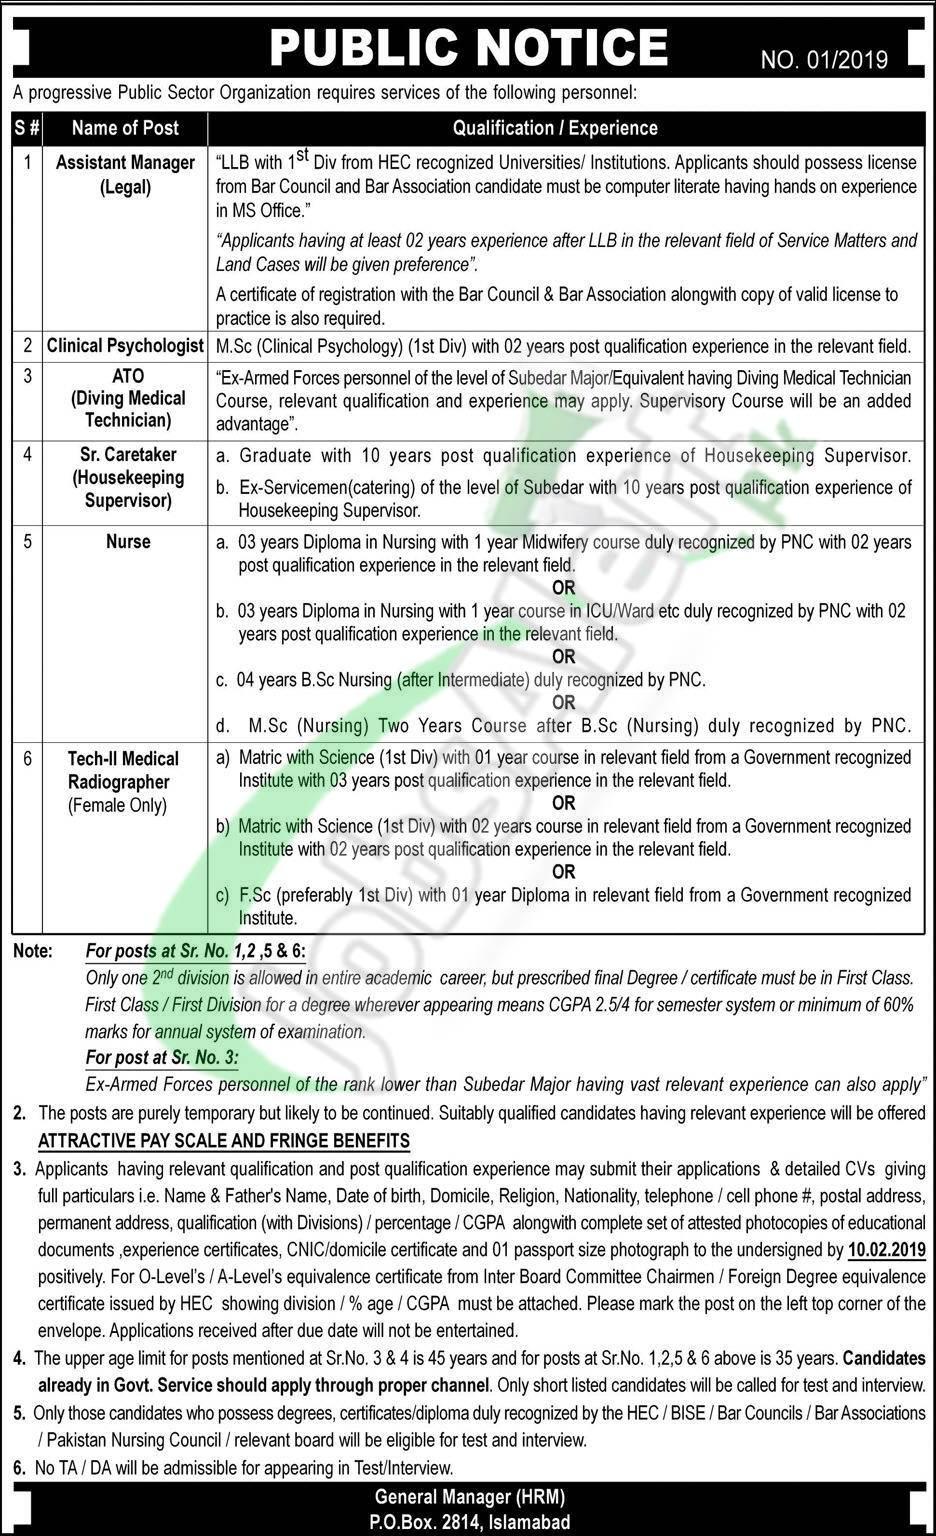 PO Box 2814 Islamabad Jobs